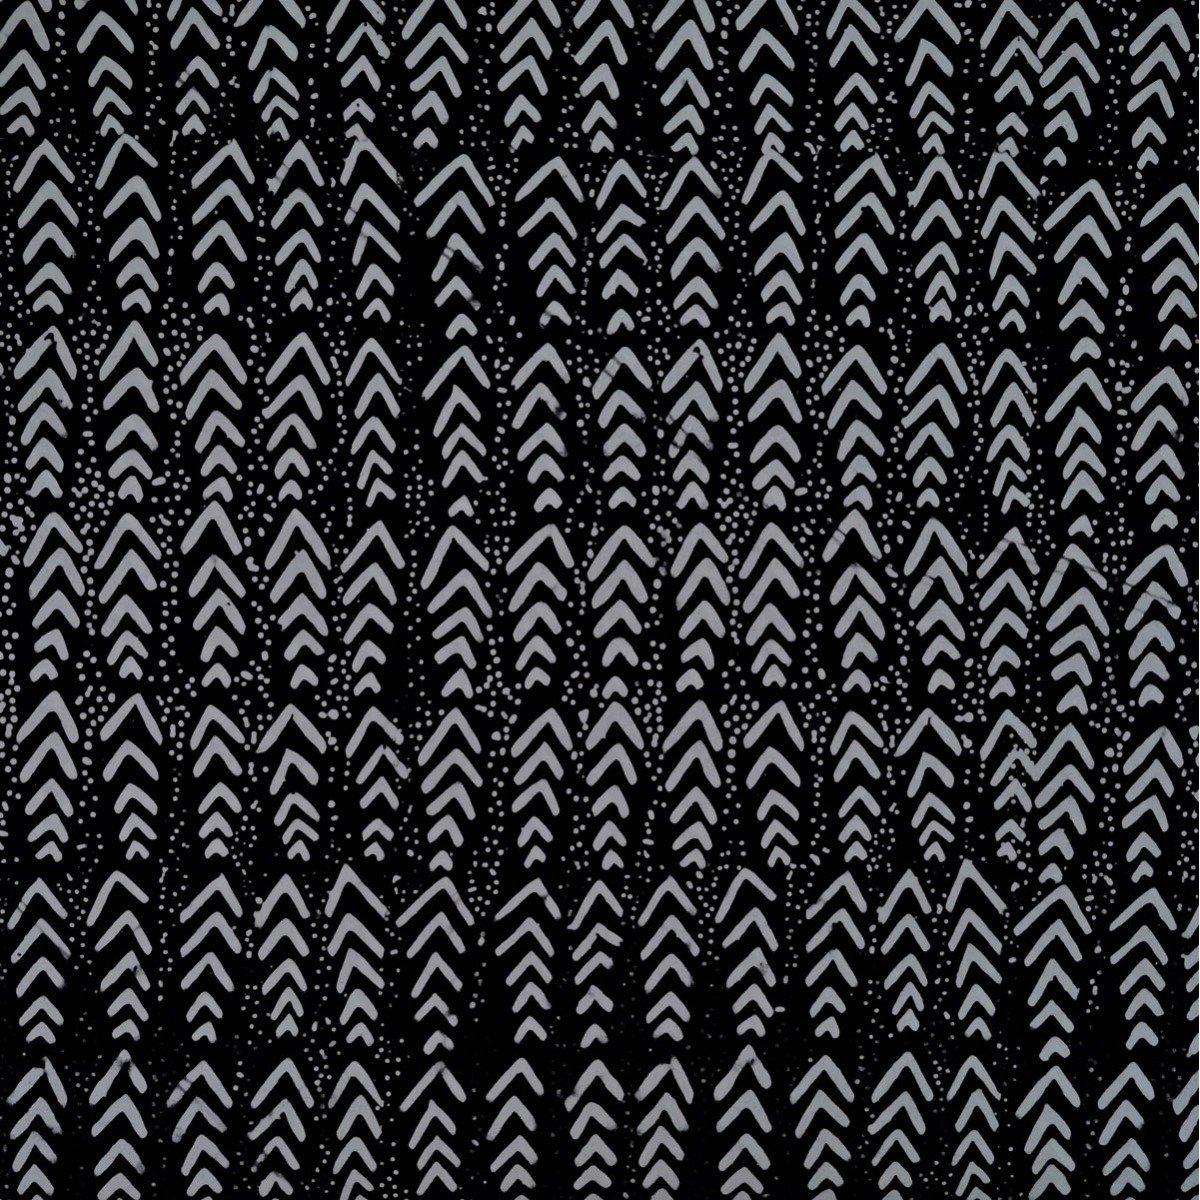 Rayon Batik - Geo Classics - Arrows - Black